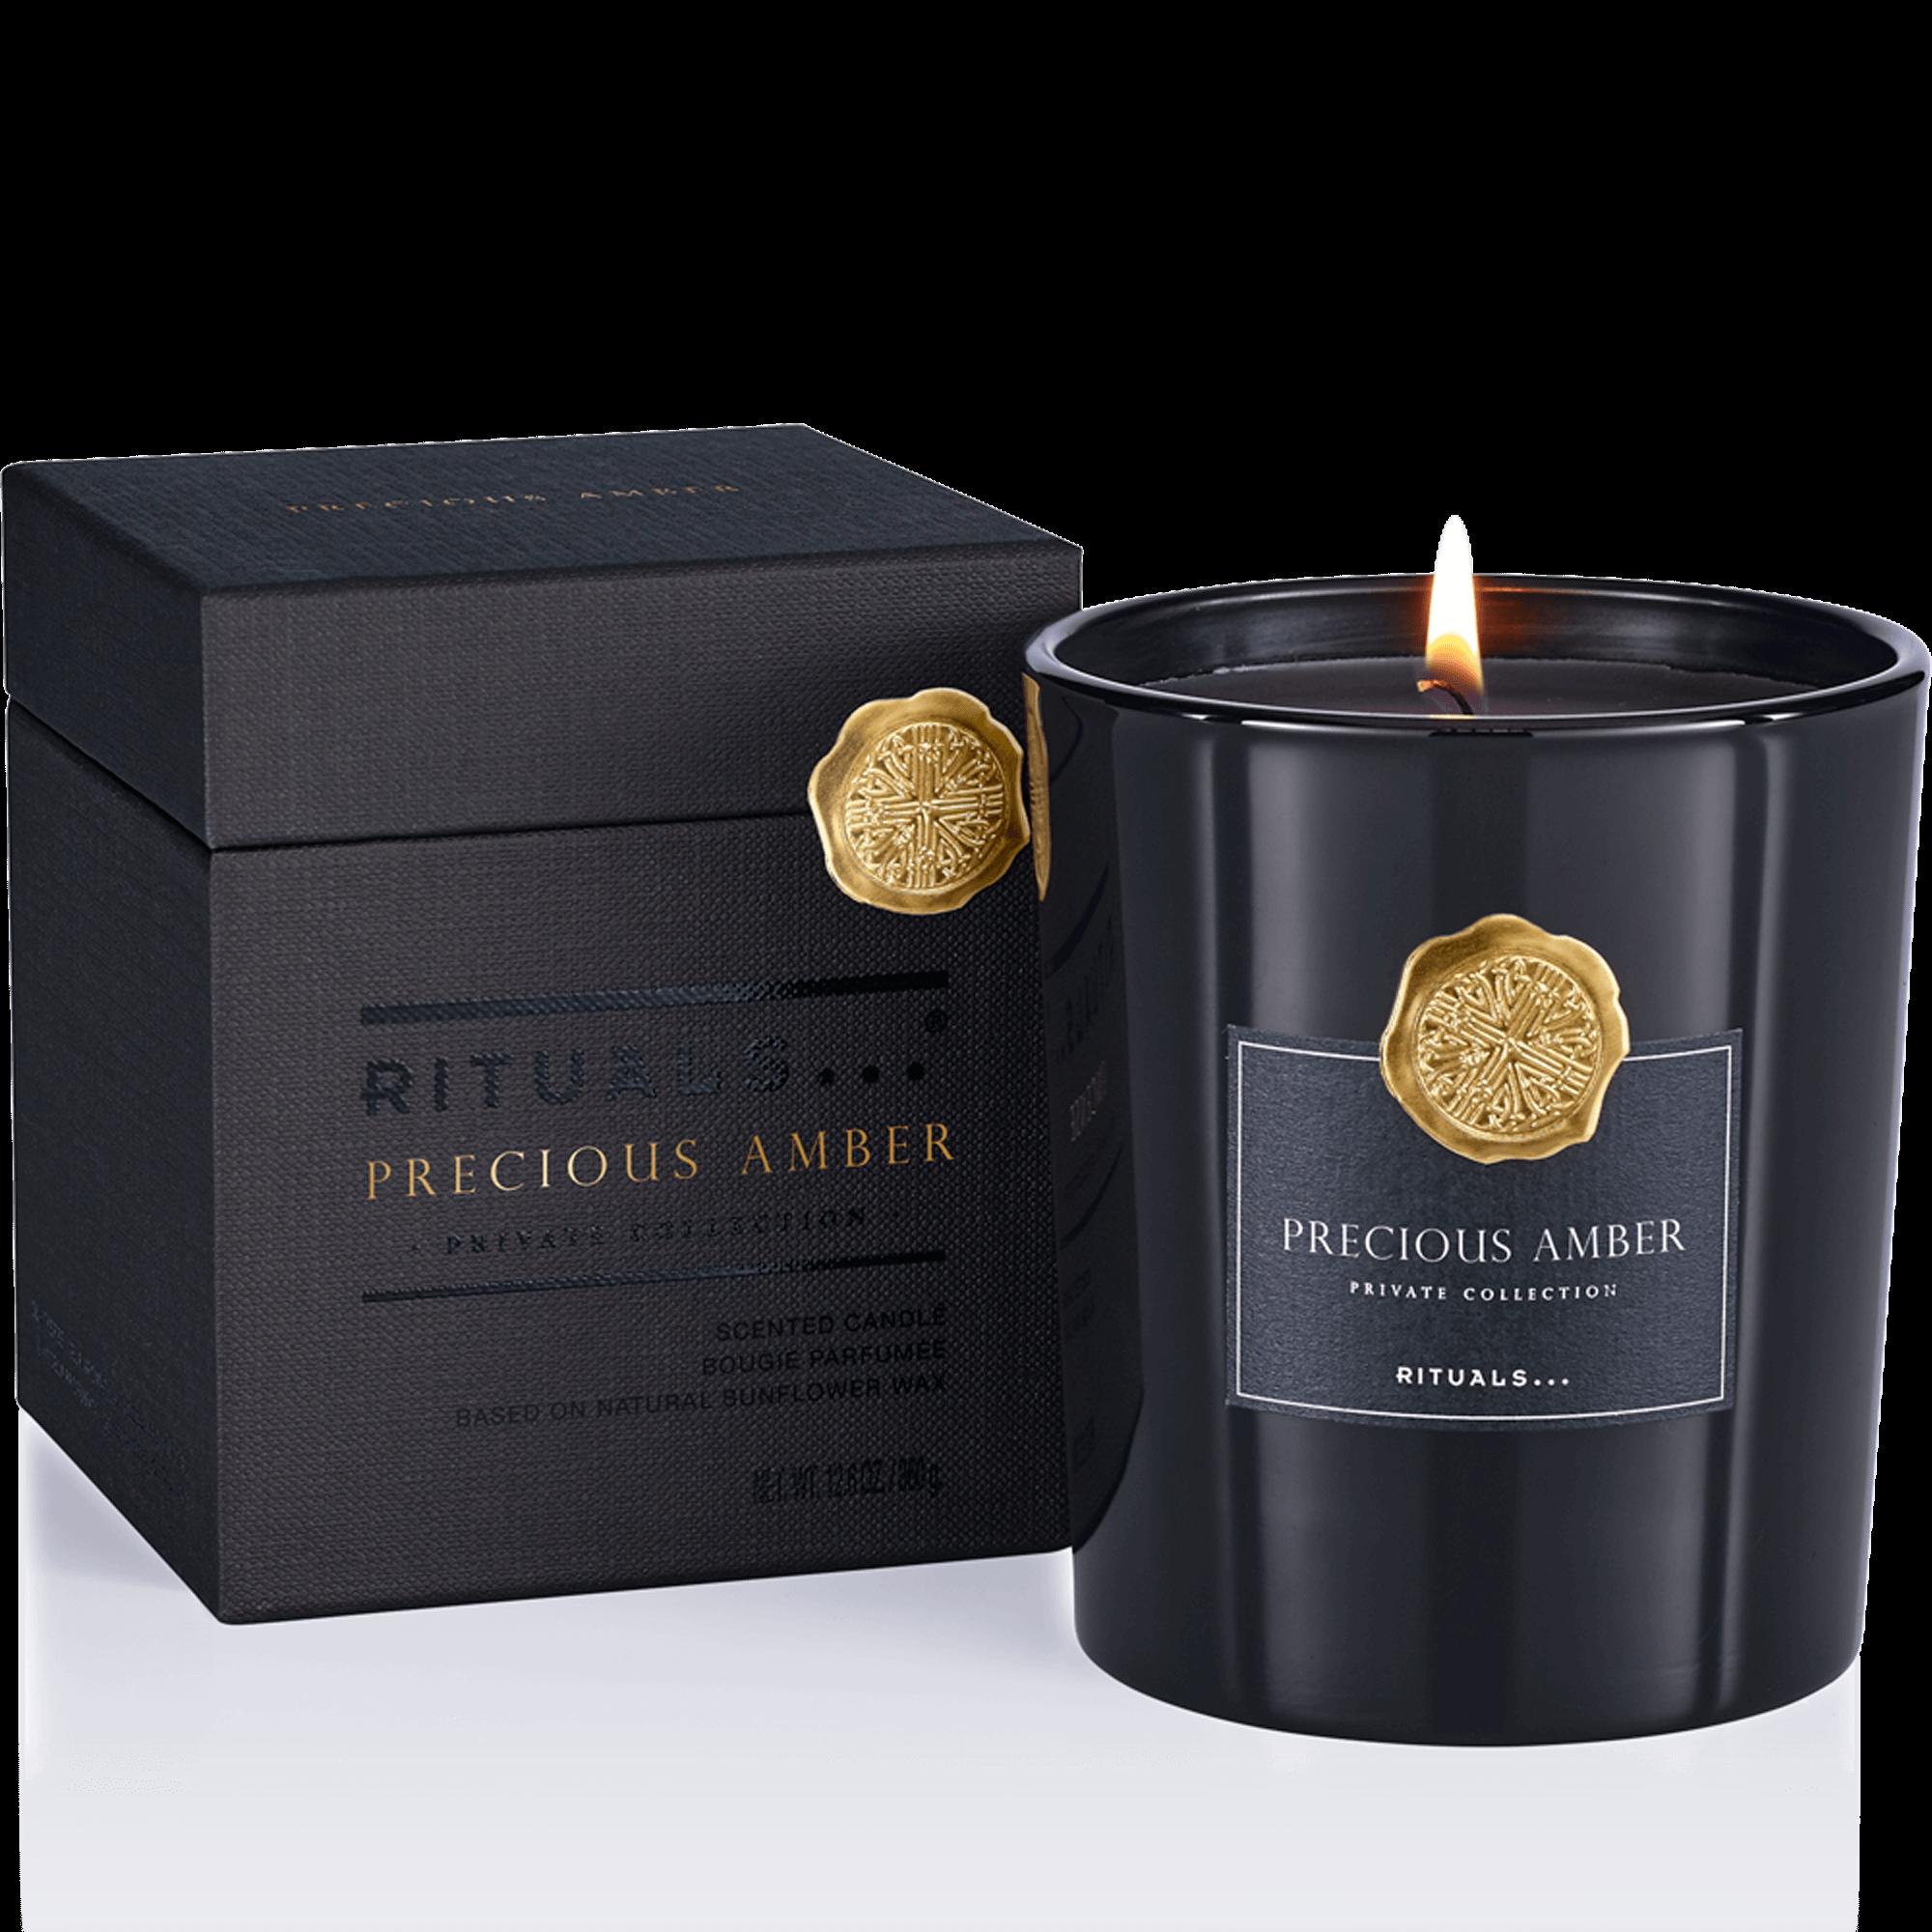 Precious Amber Scented Candle Duftkerzen Kerzen Luxuriose Geschenke